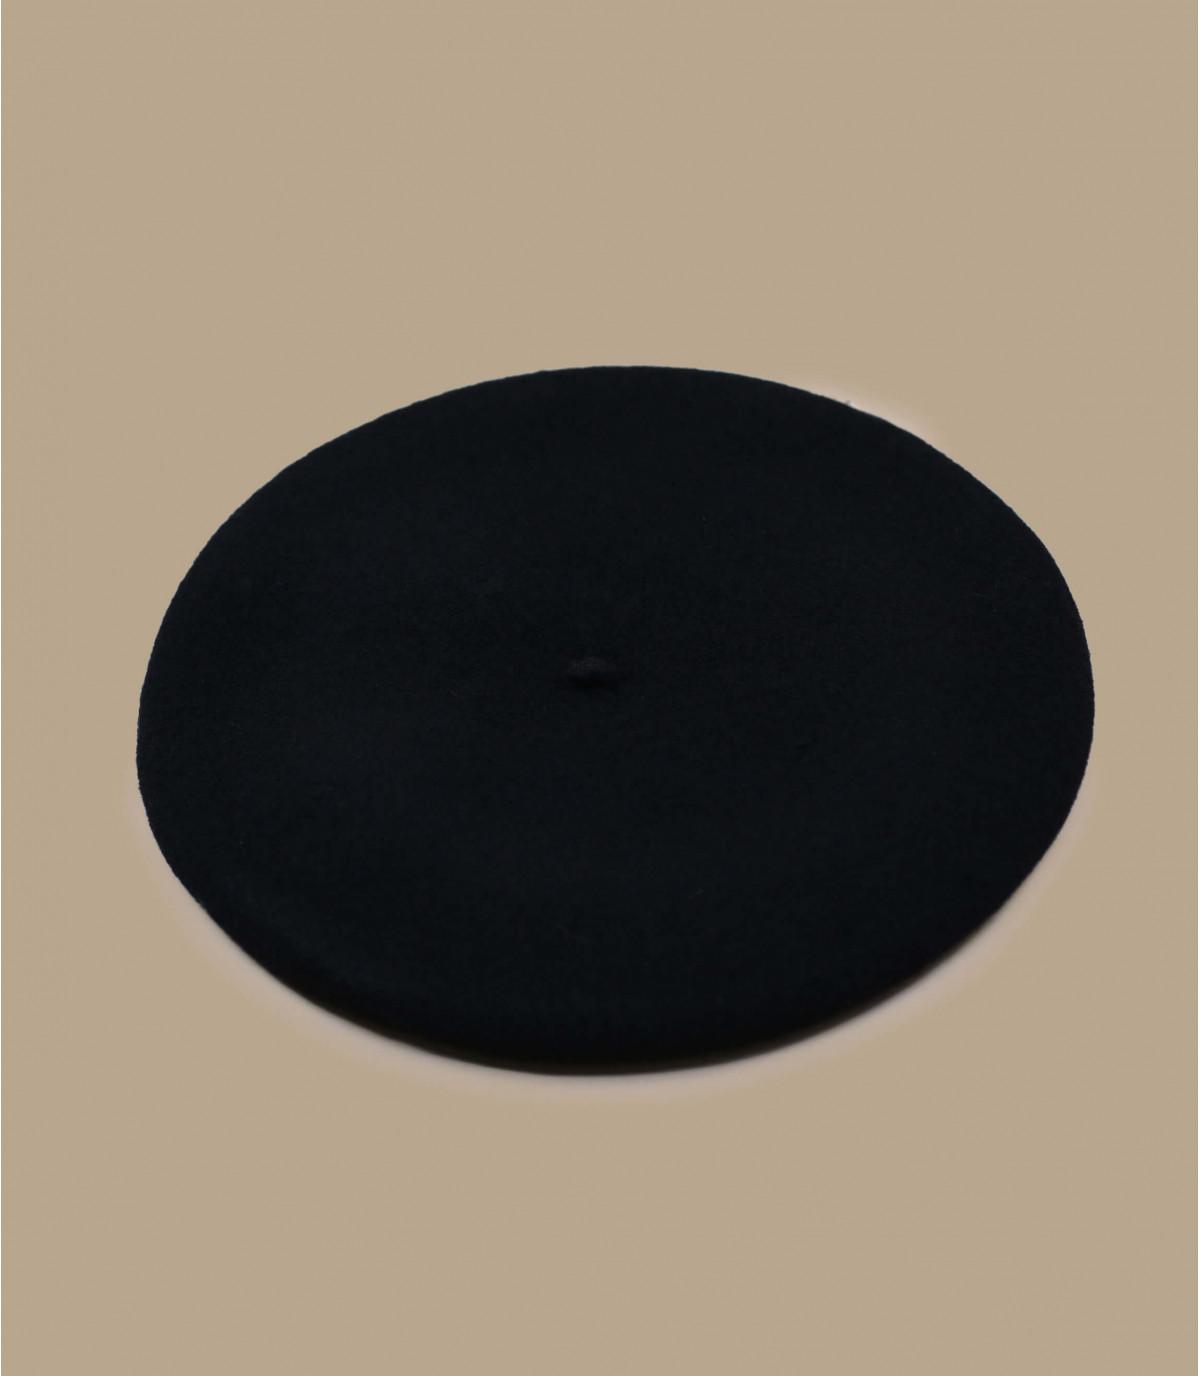 Detalles Boina paris negra imagen 2